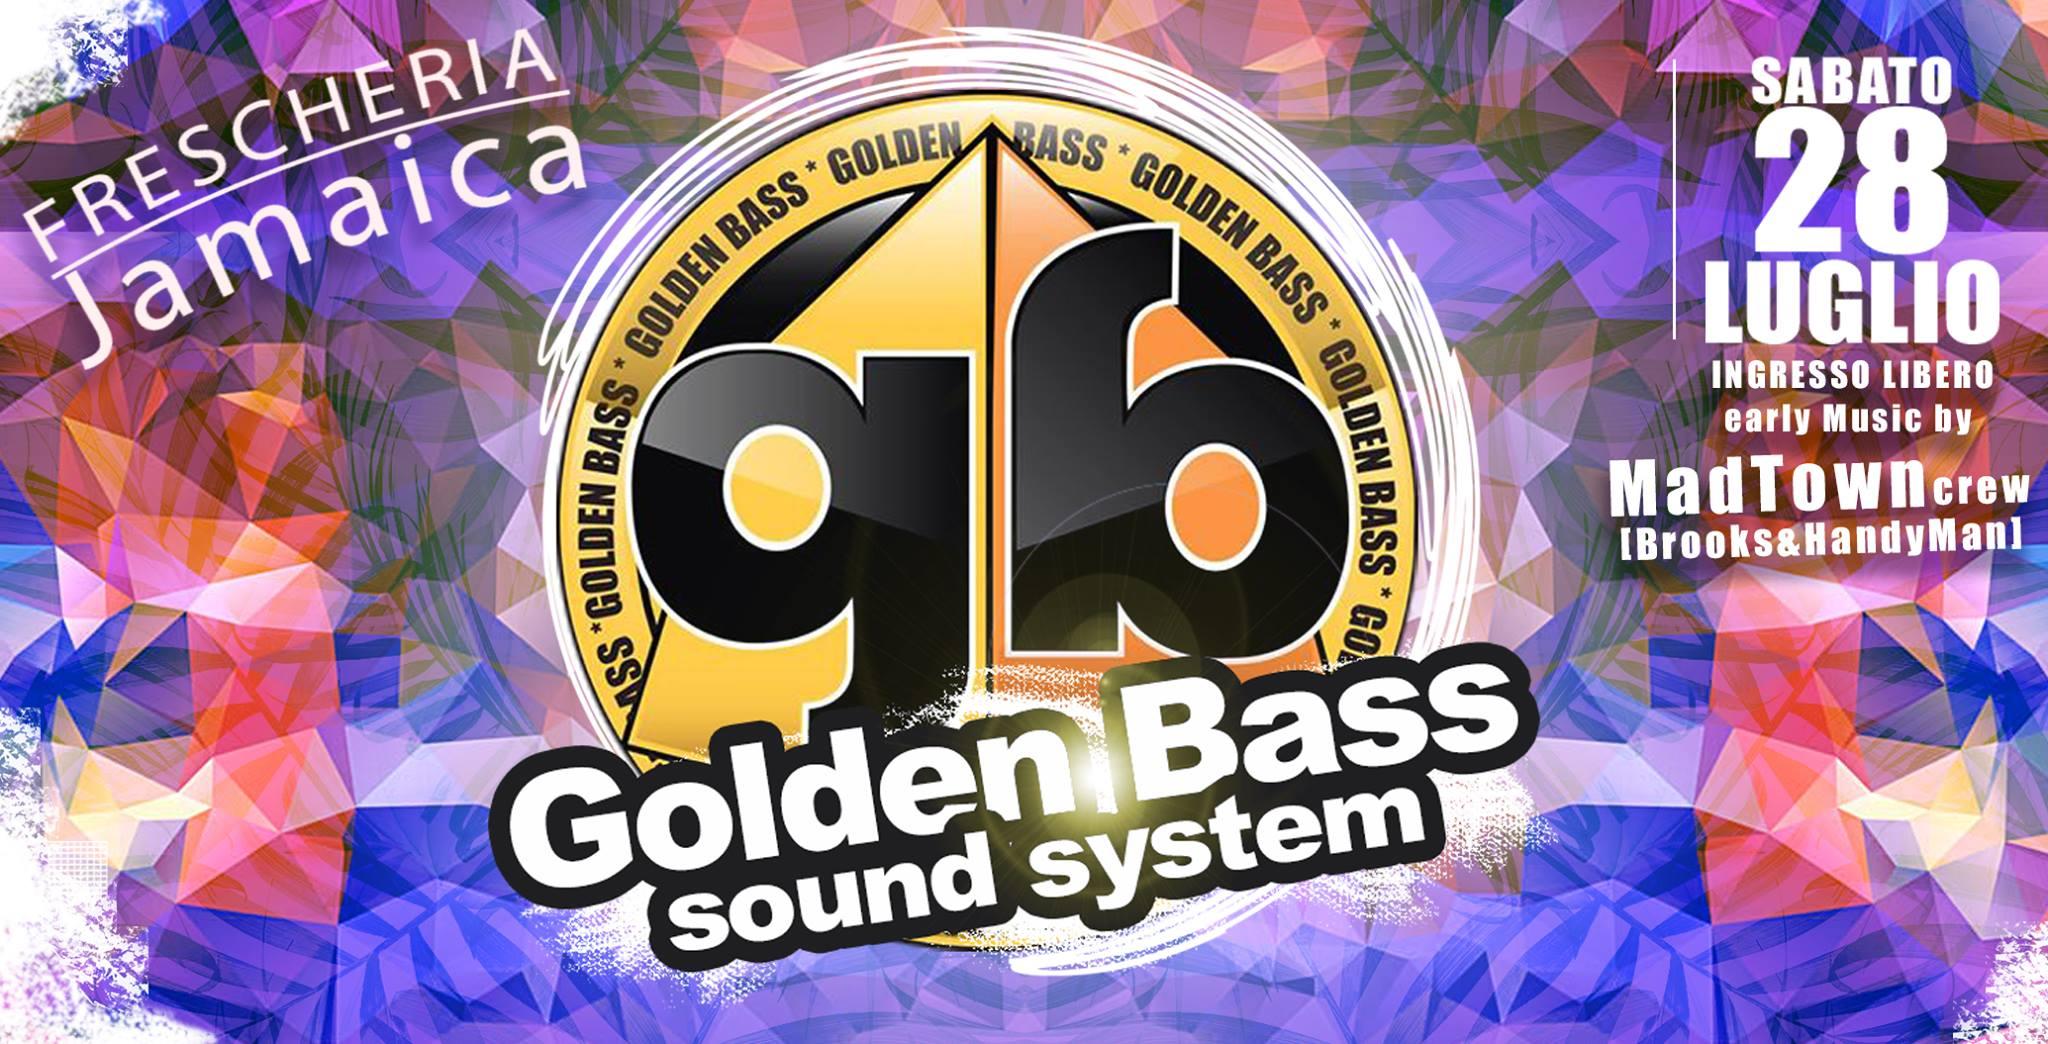 Golden Bass sound system alla Dancehall